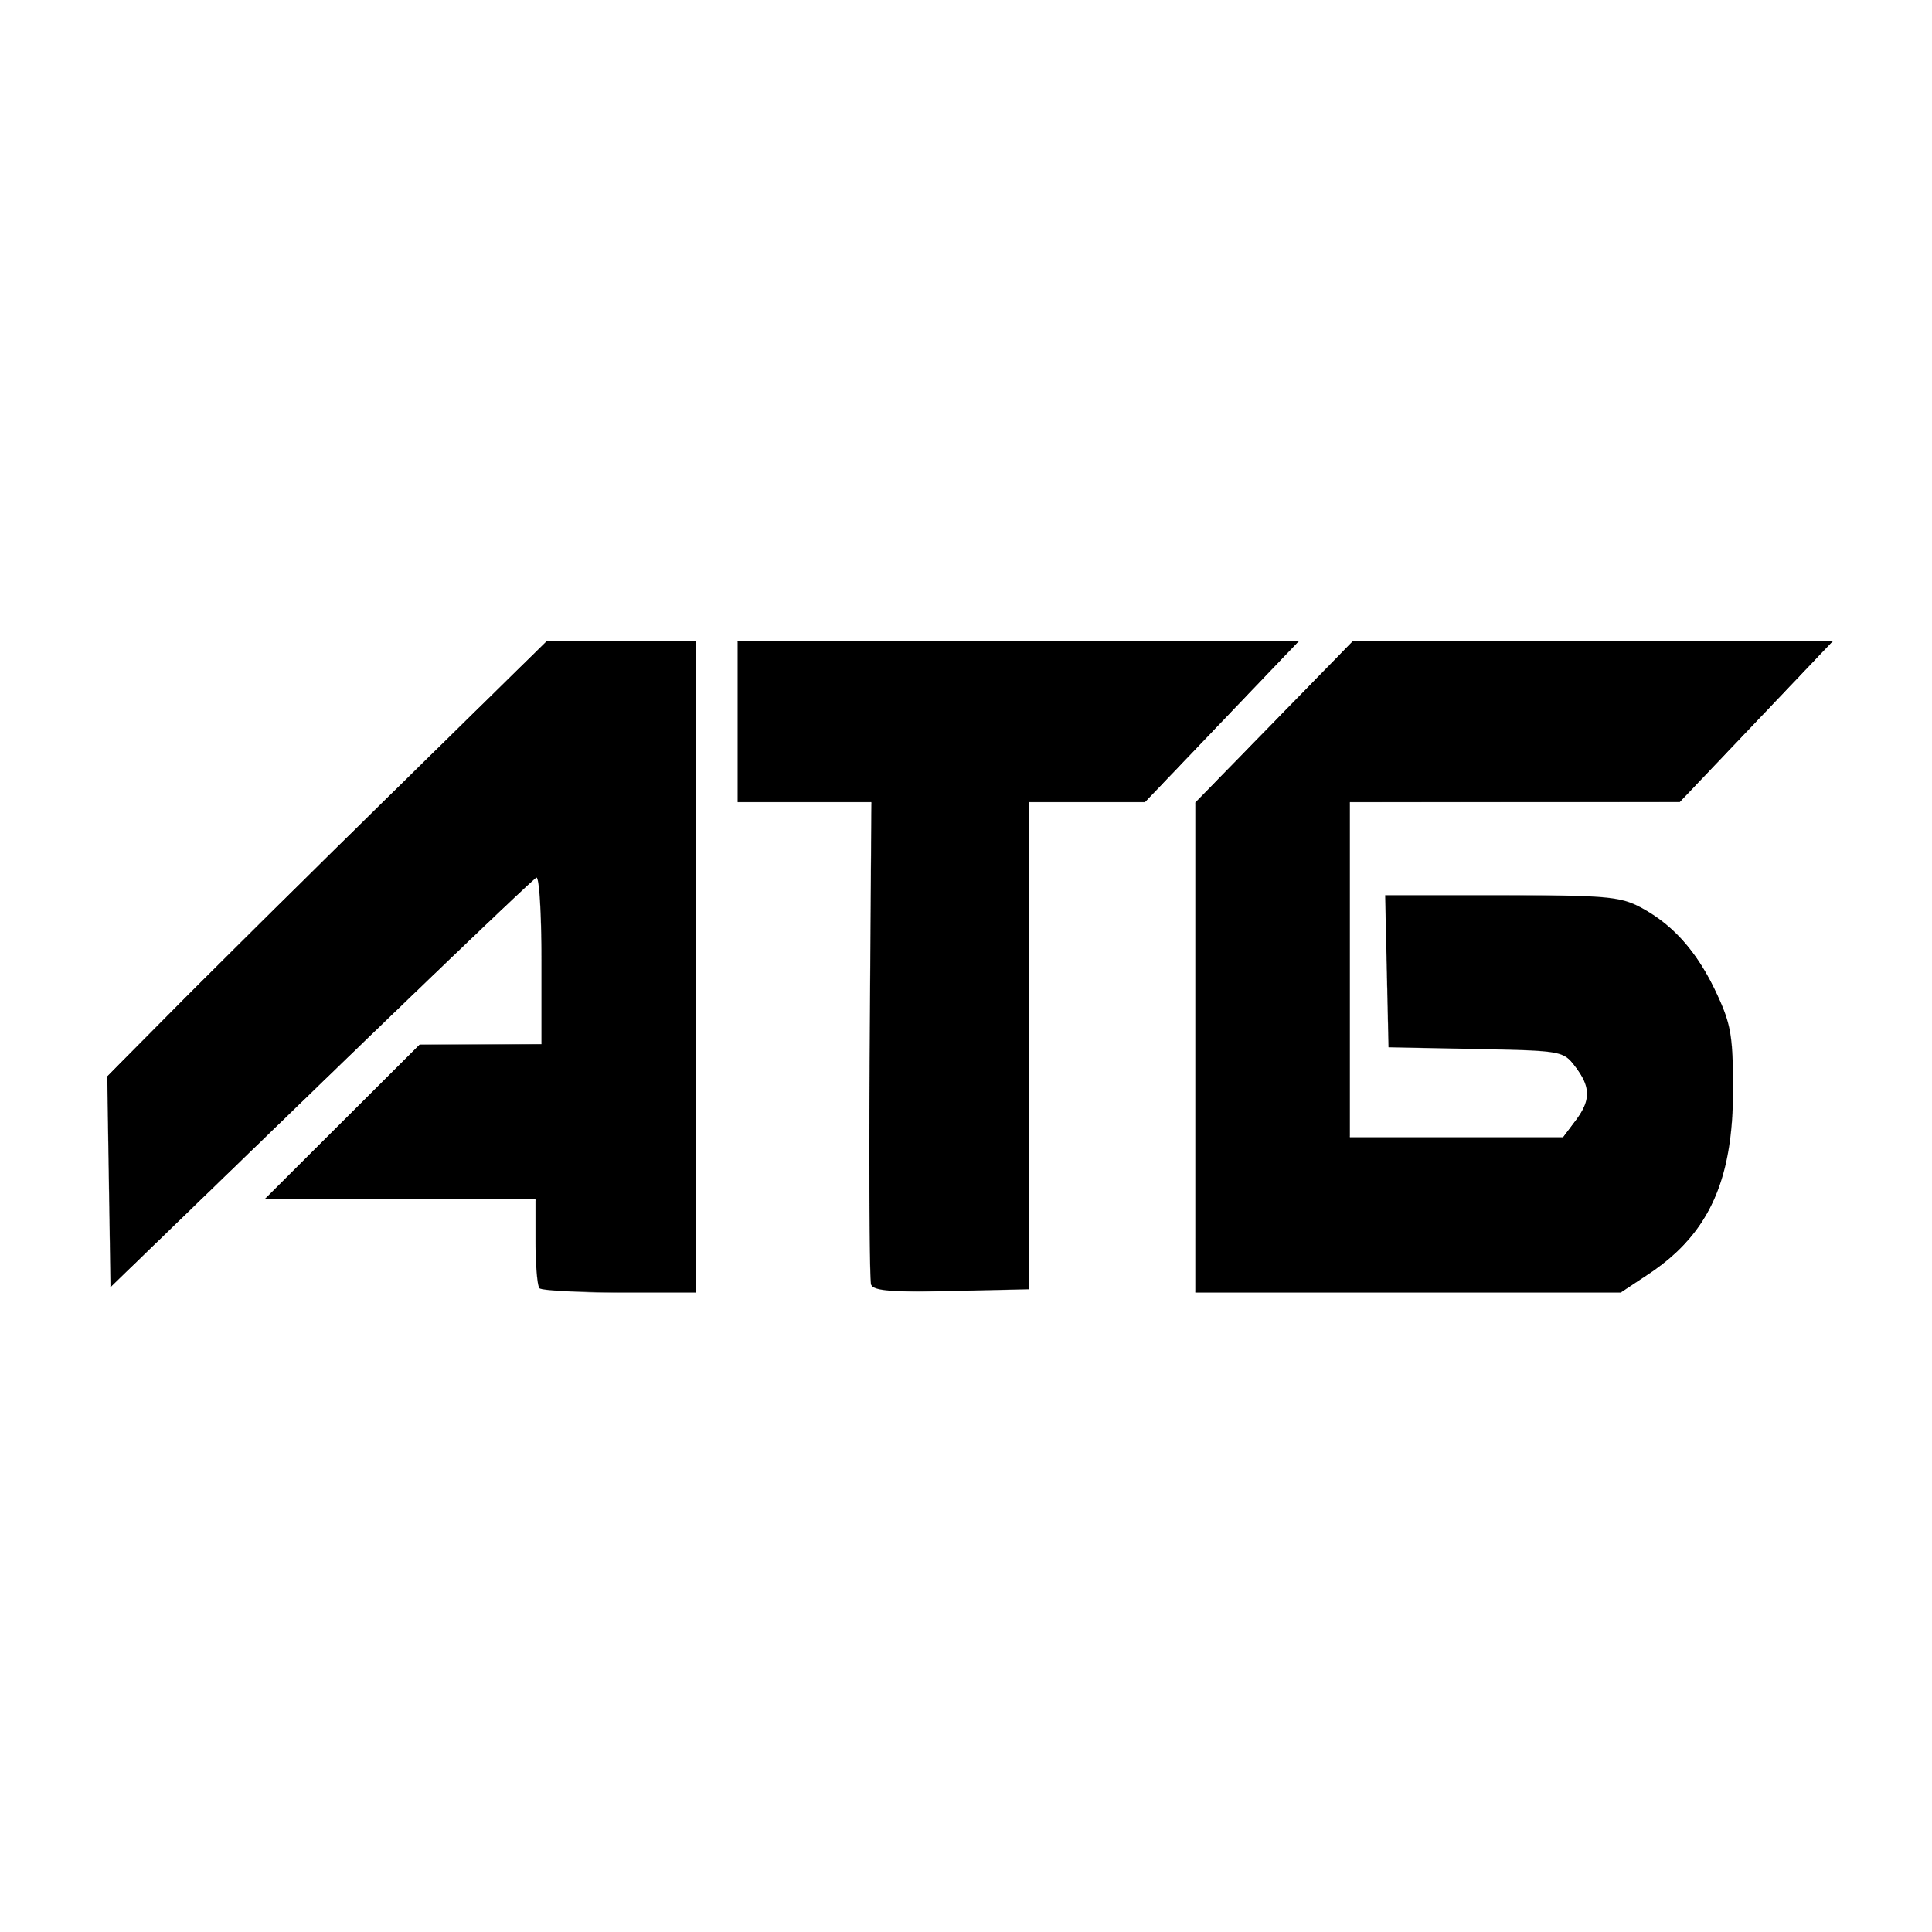 atb-4.png